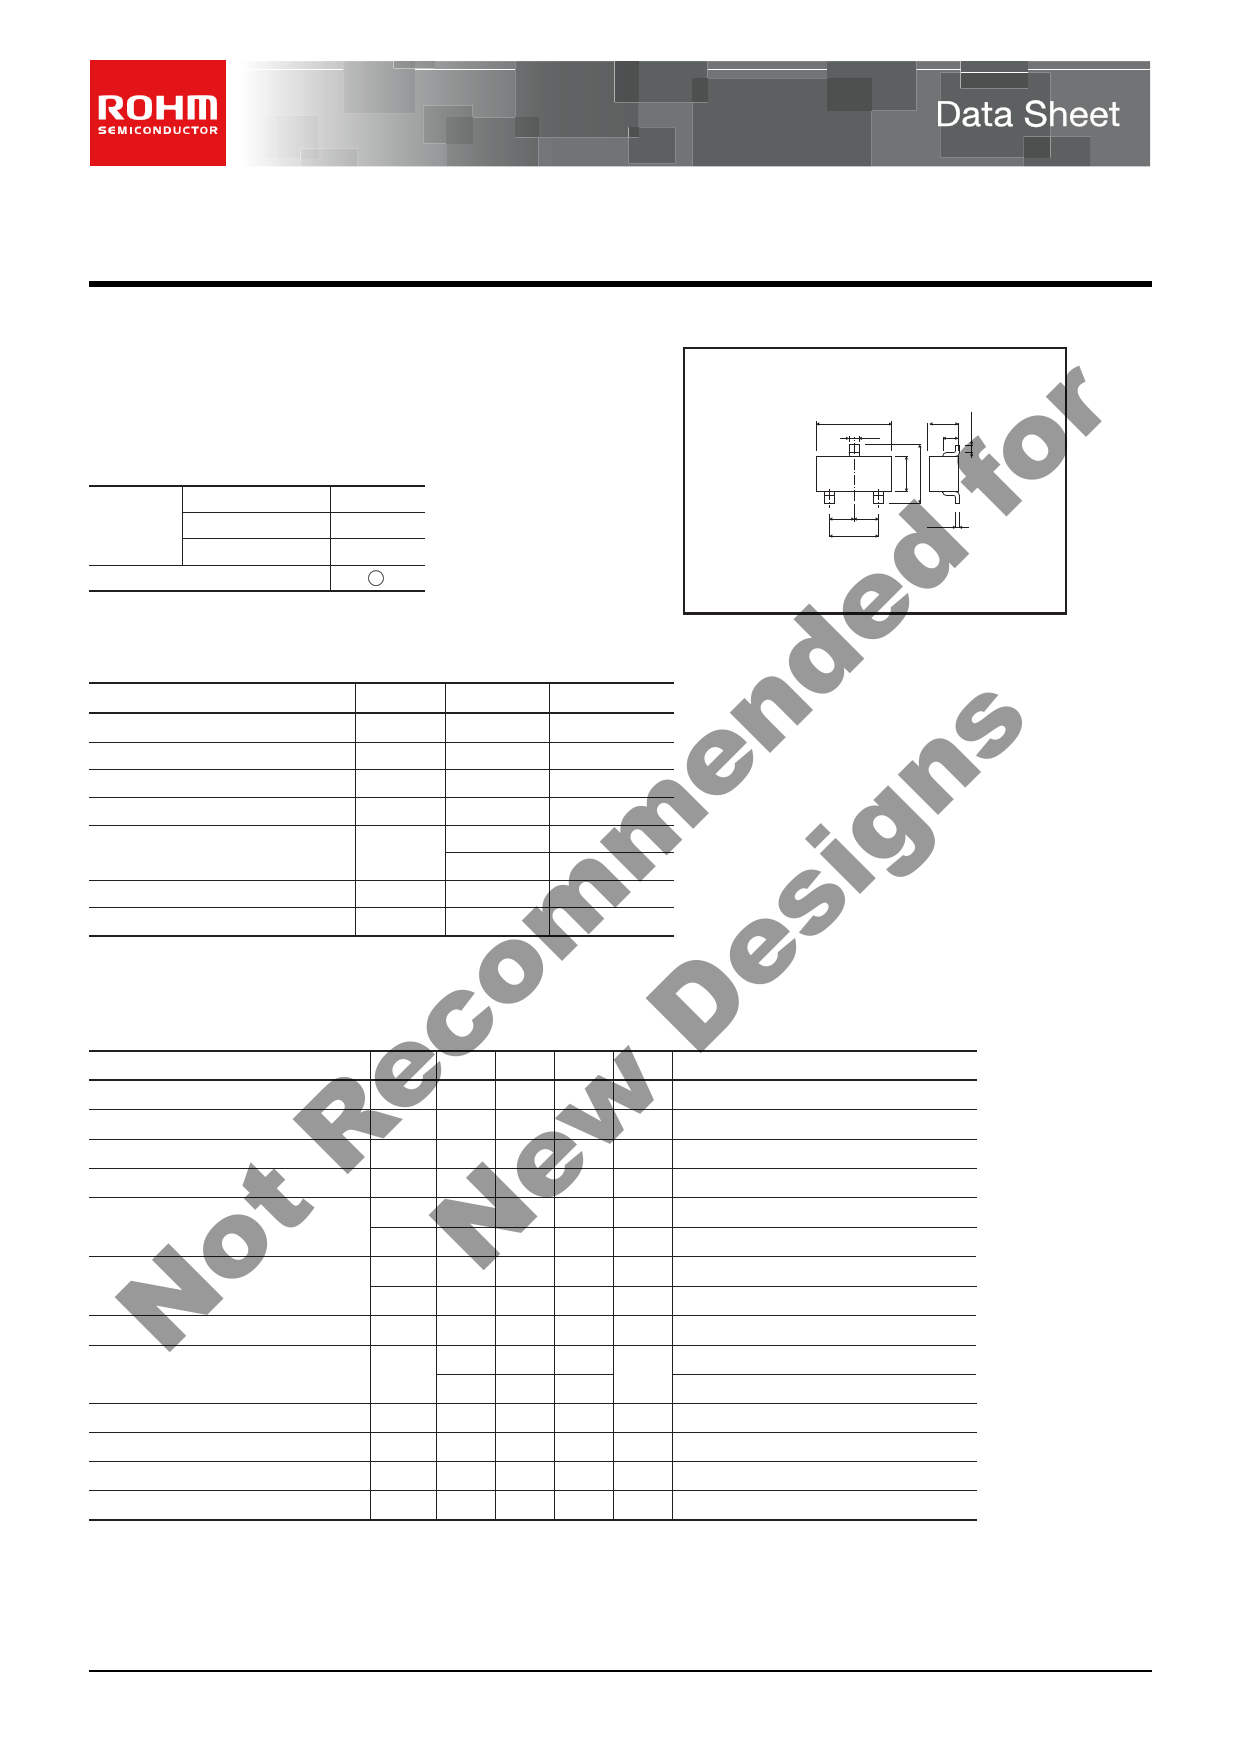 BCX71H 데이터시트 및 BCX71H PDF